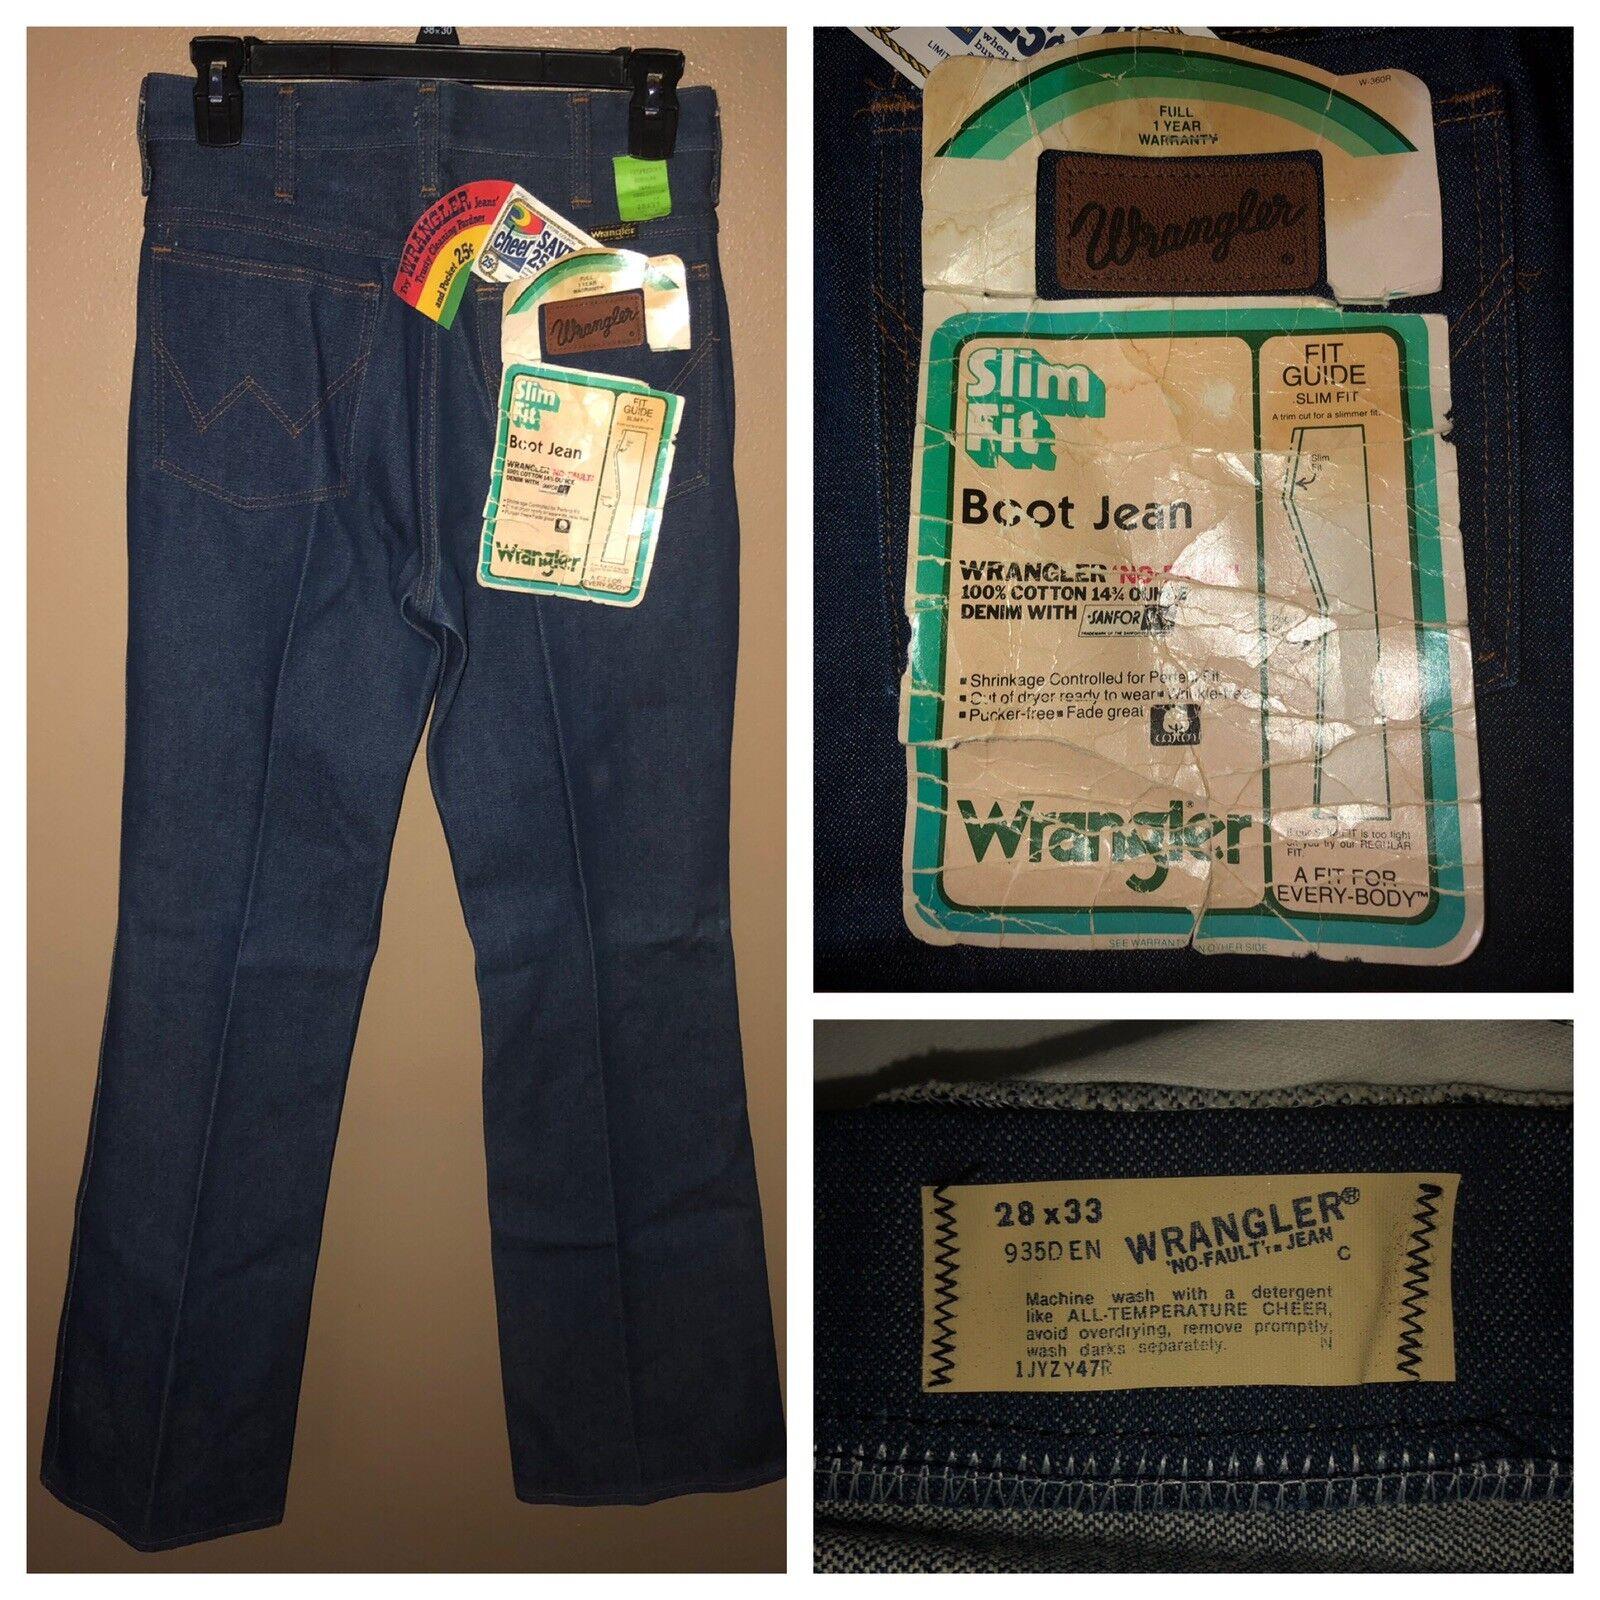 VTG 70s WRANGLER Men's Slim Fit Boot Denim bluee Jeans NO FAULT 28x33 NOS w TAGS